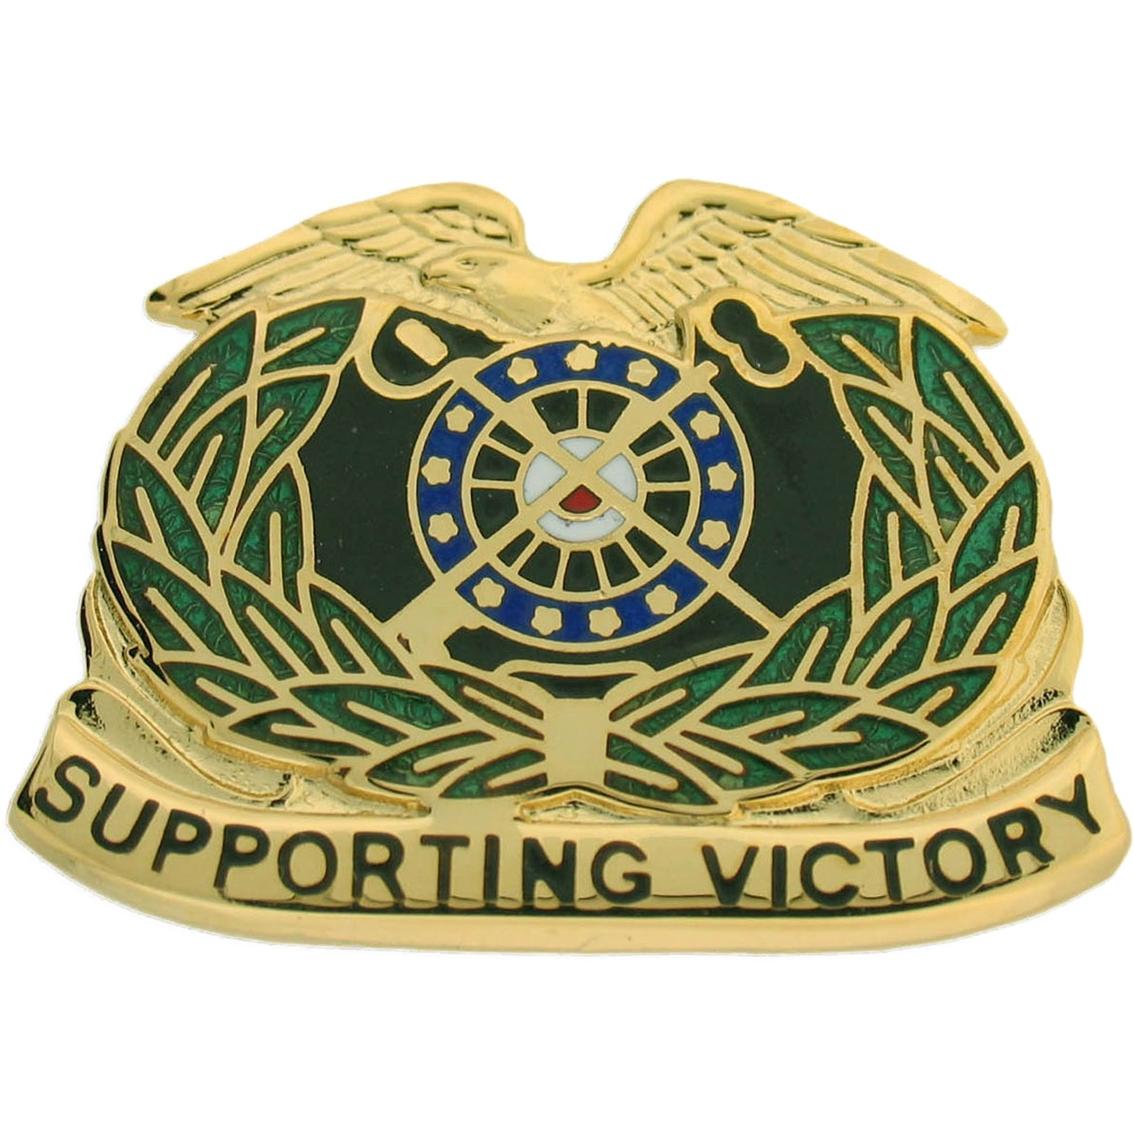 Army Quartermaster Corps (qm) Regimental Crest ...